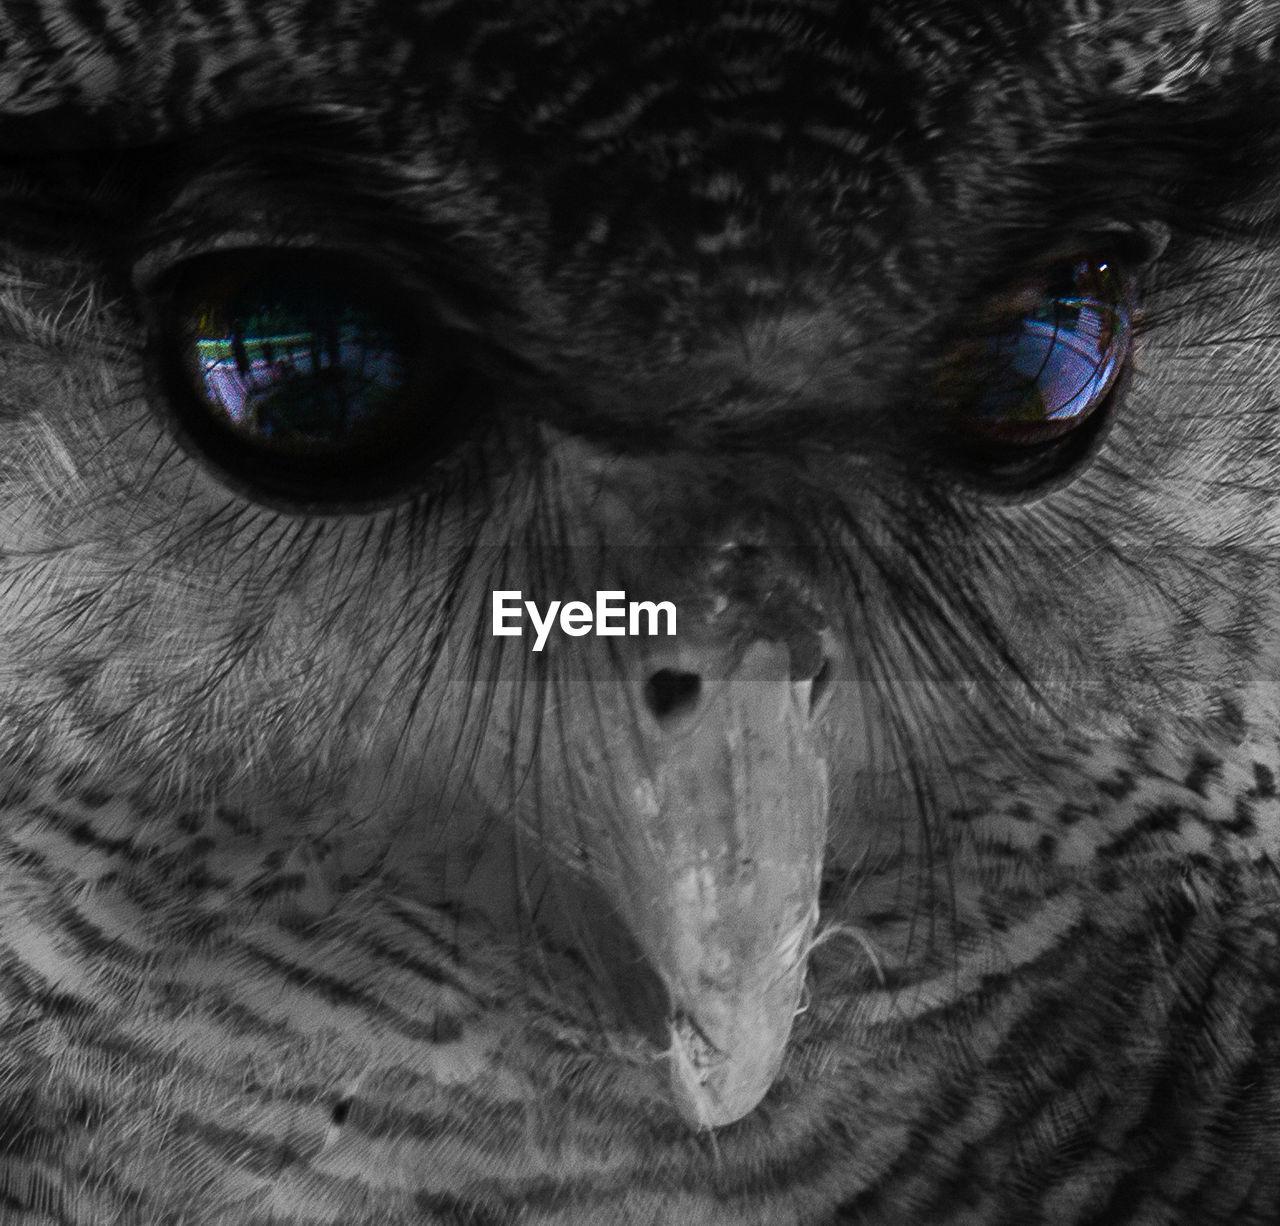 Extreme close-up portrait of owl